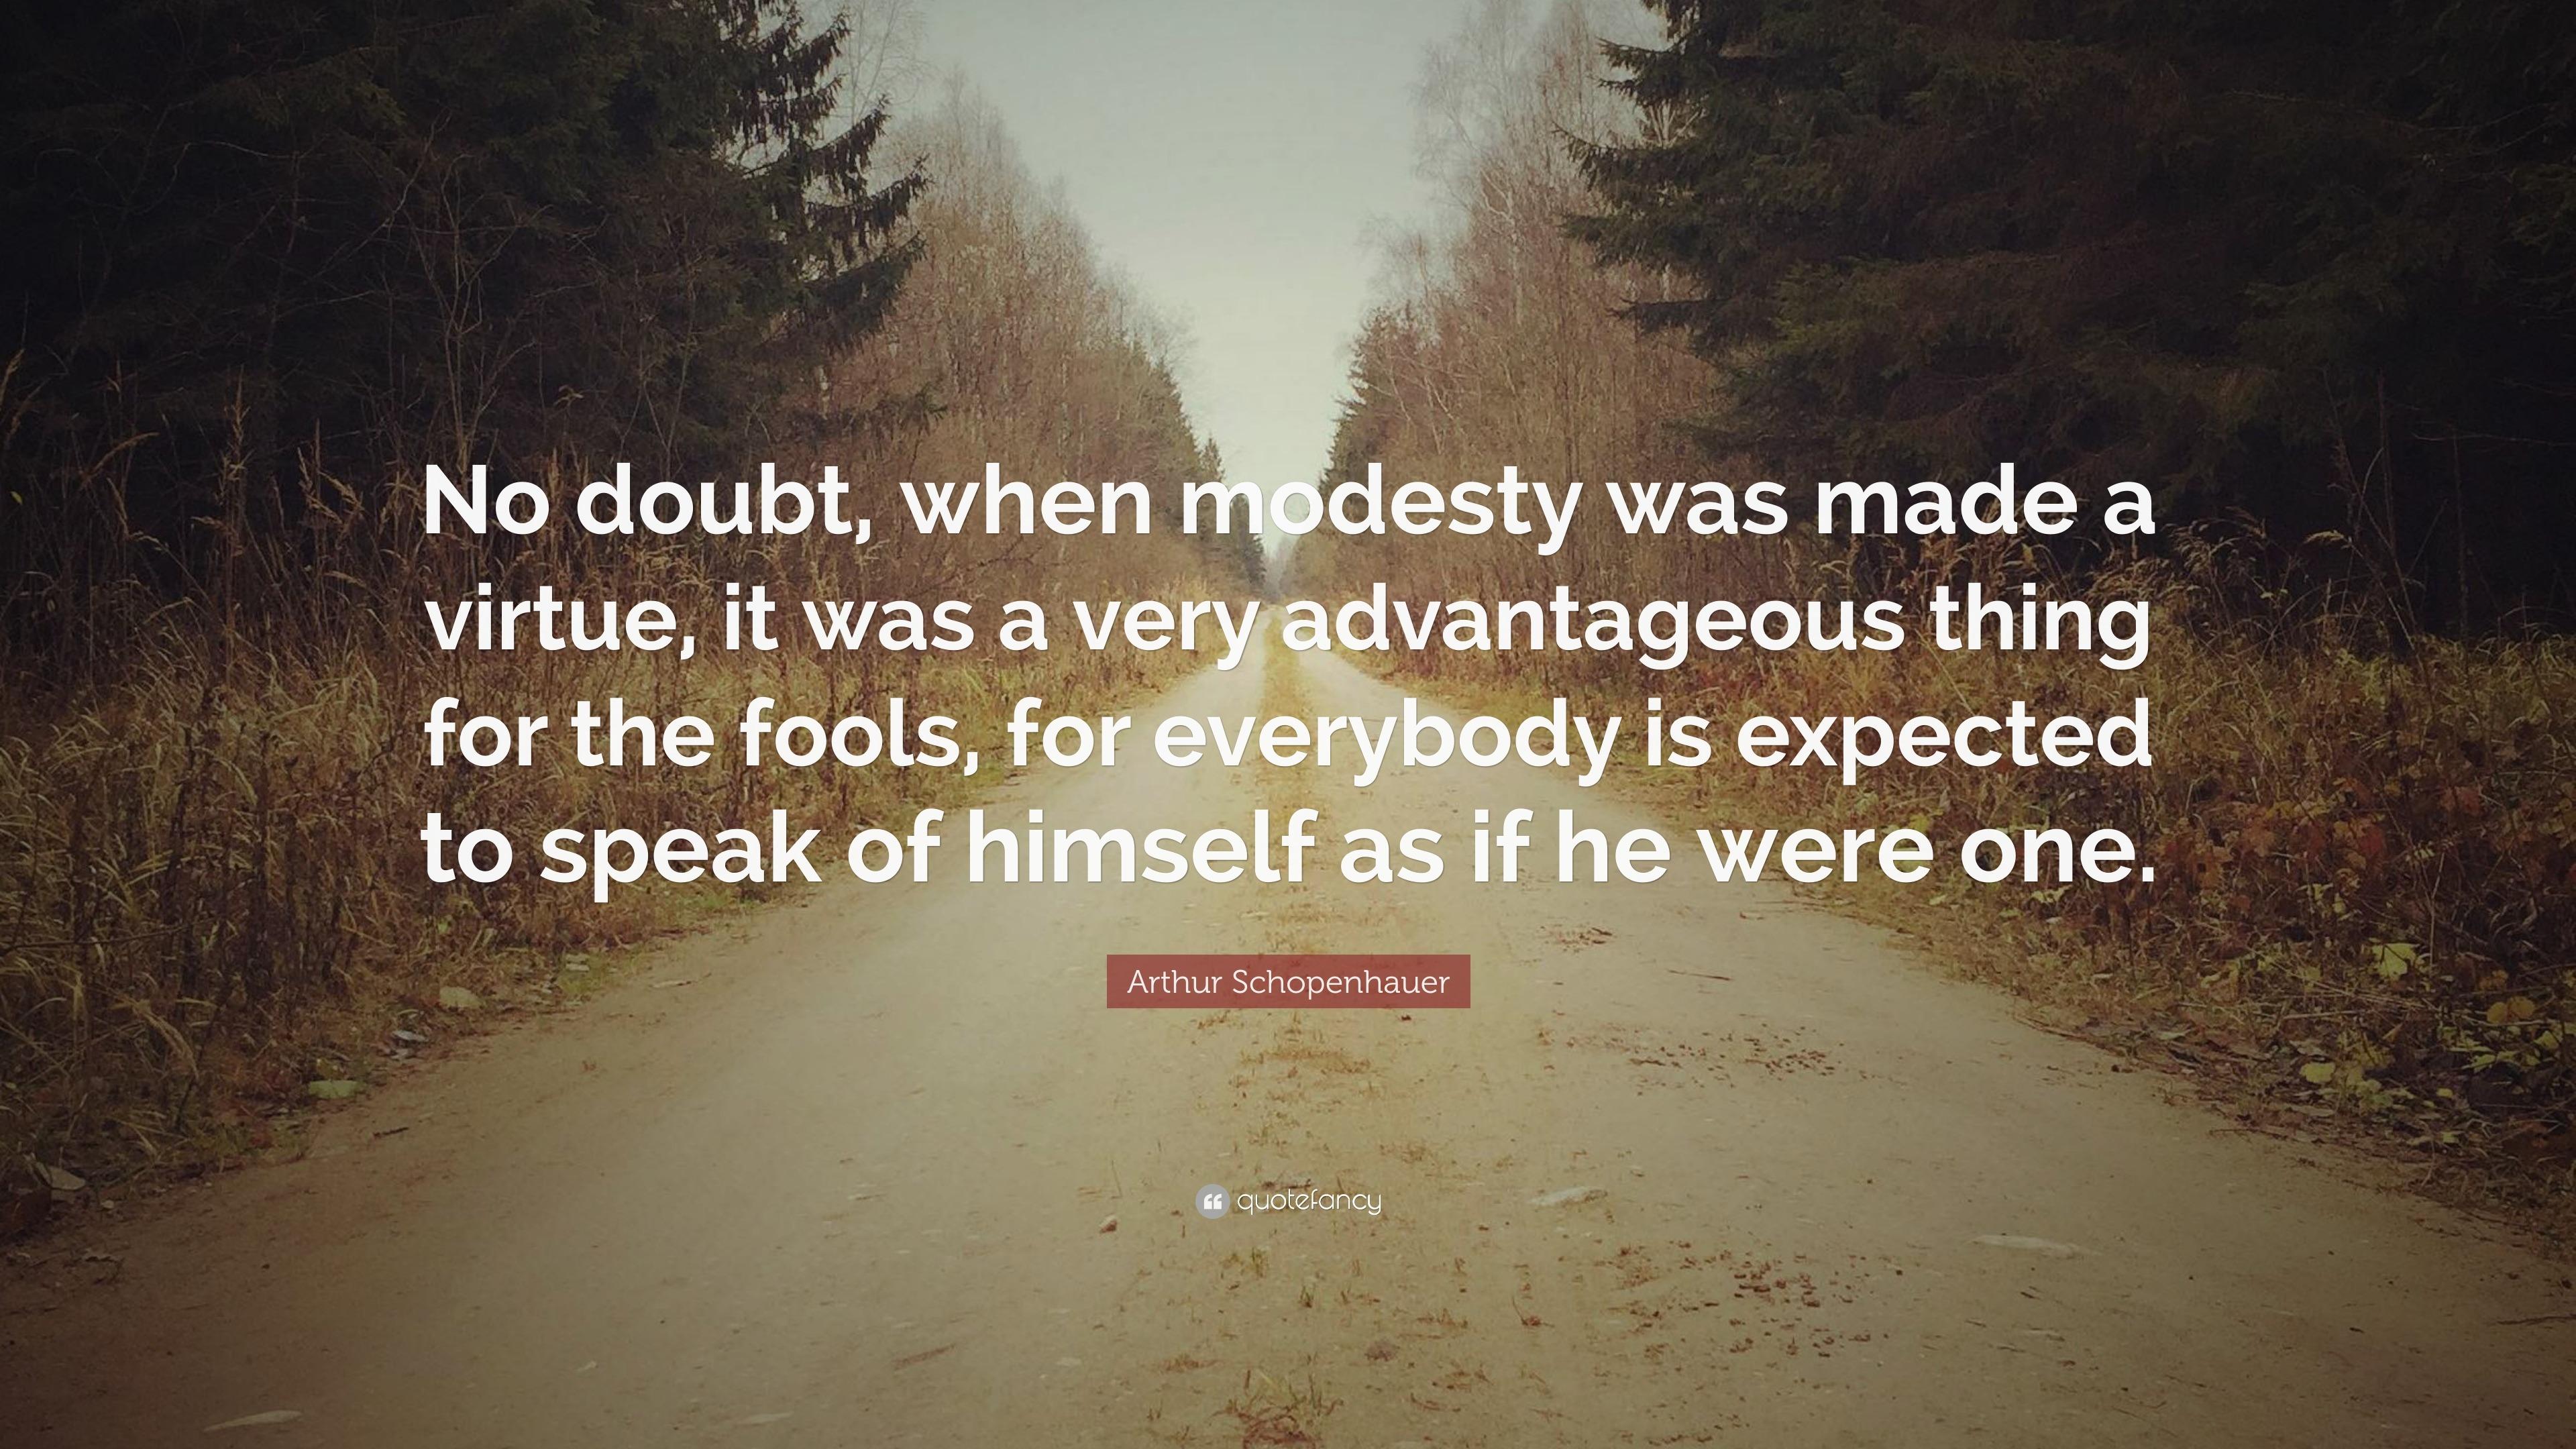 [Image: 210456-Arthur-Schopenhauer-Quote-No-doub...virtue.jpg]